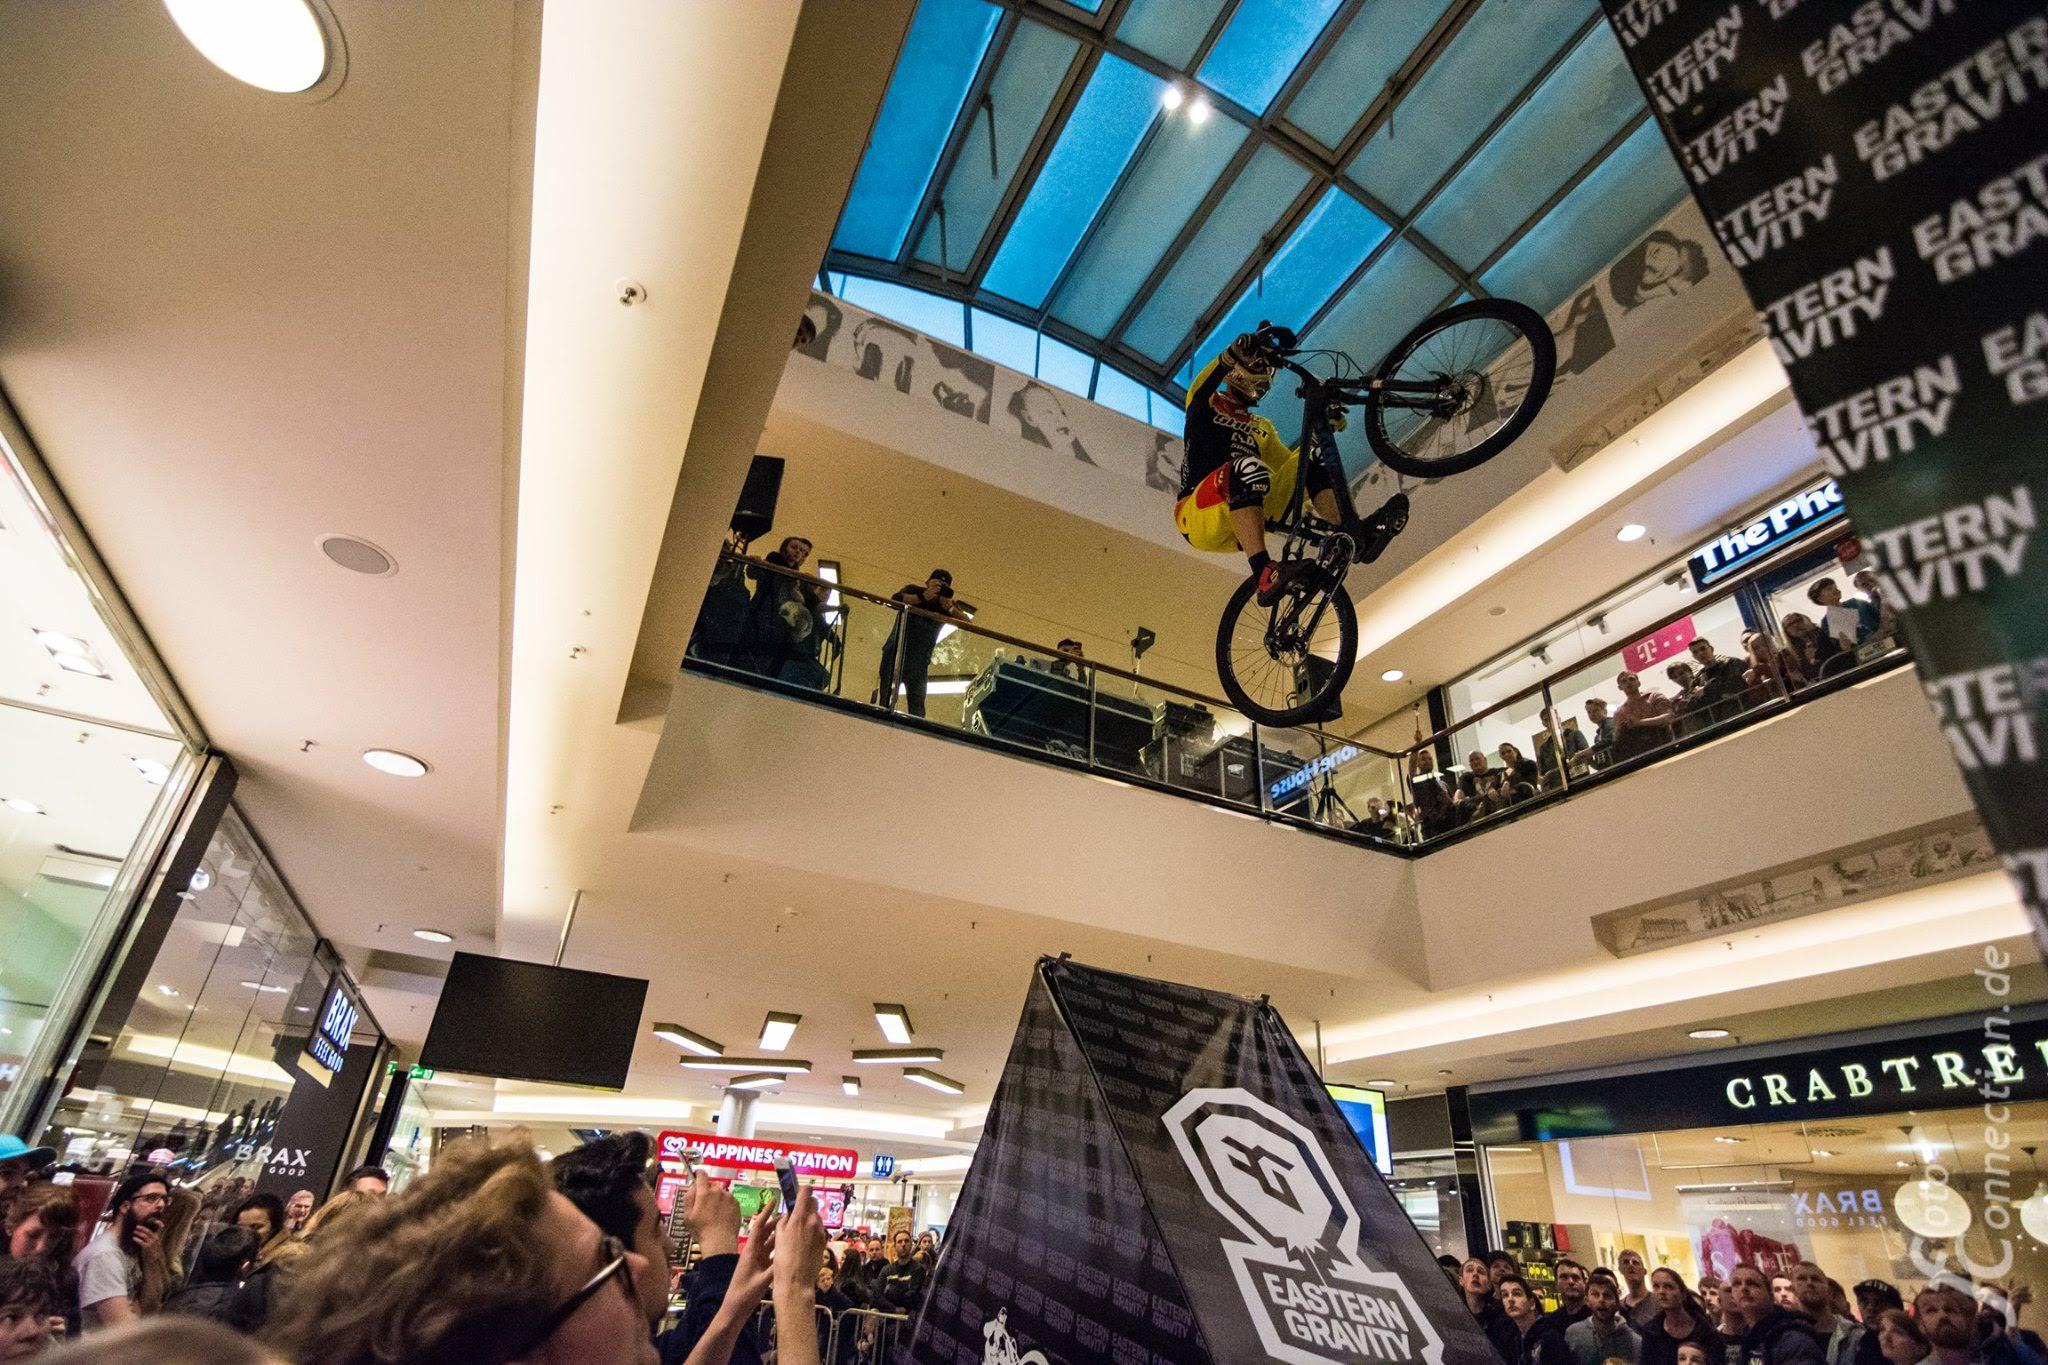 Down Mall Tour 2016 - Hanover (TomᚠSlavík)